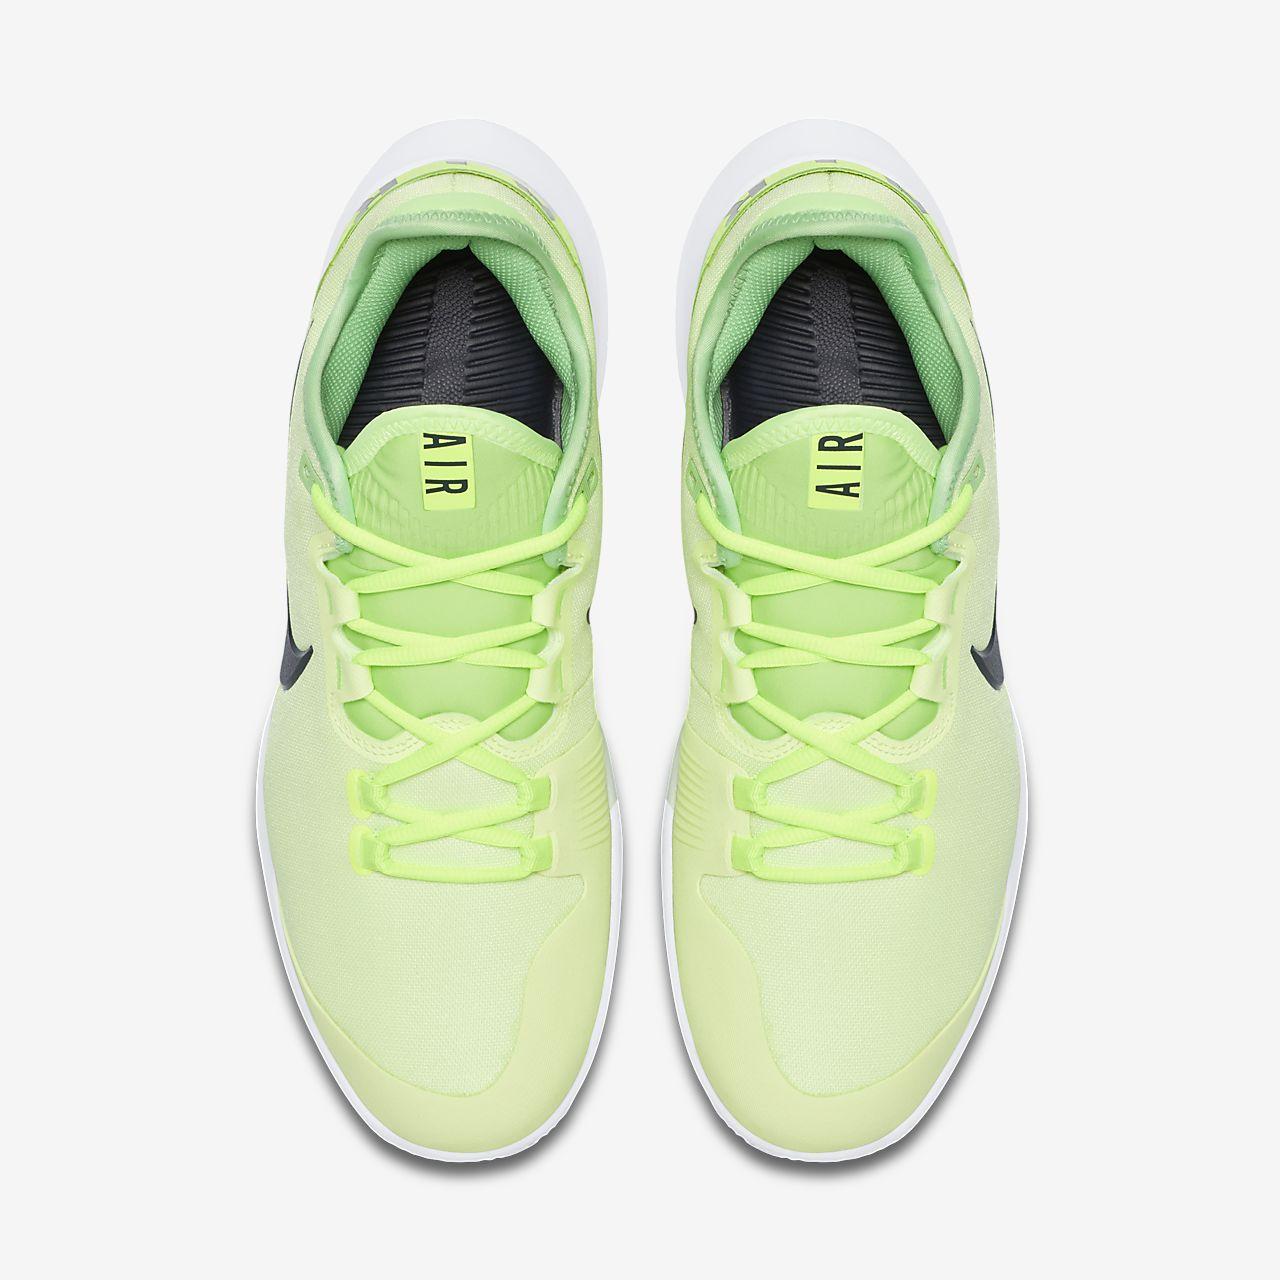 Chaussure de tennis pour terre battue NikeCourt Air Max